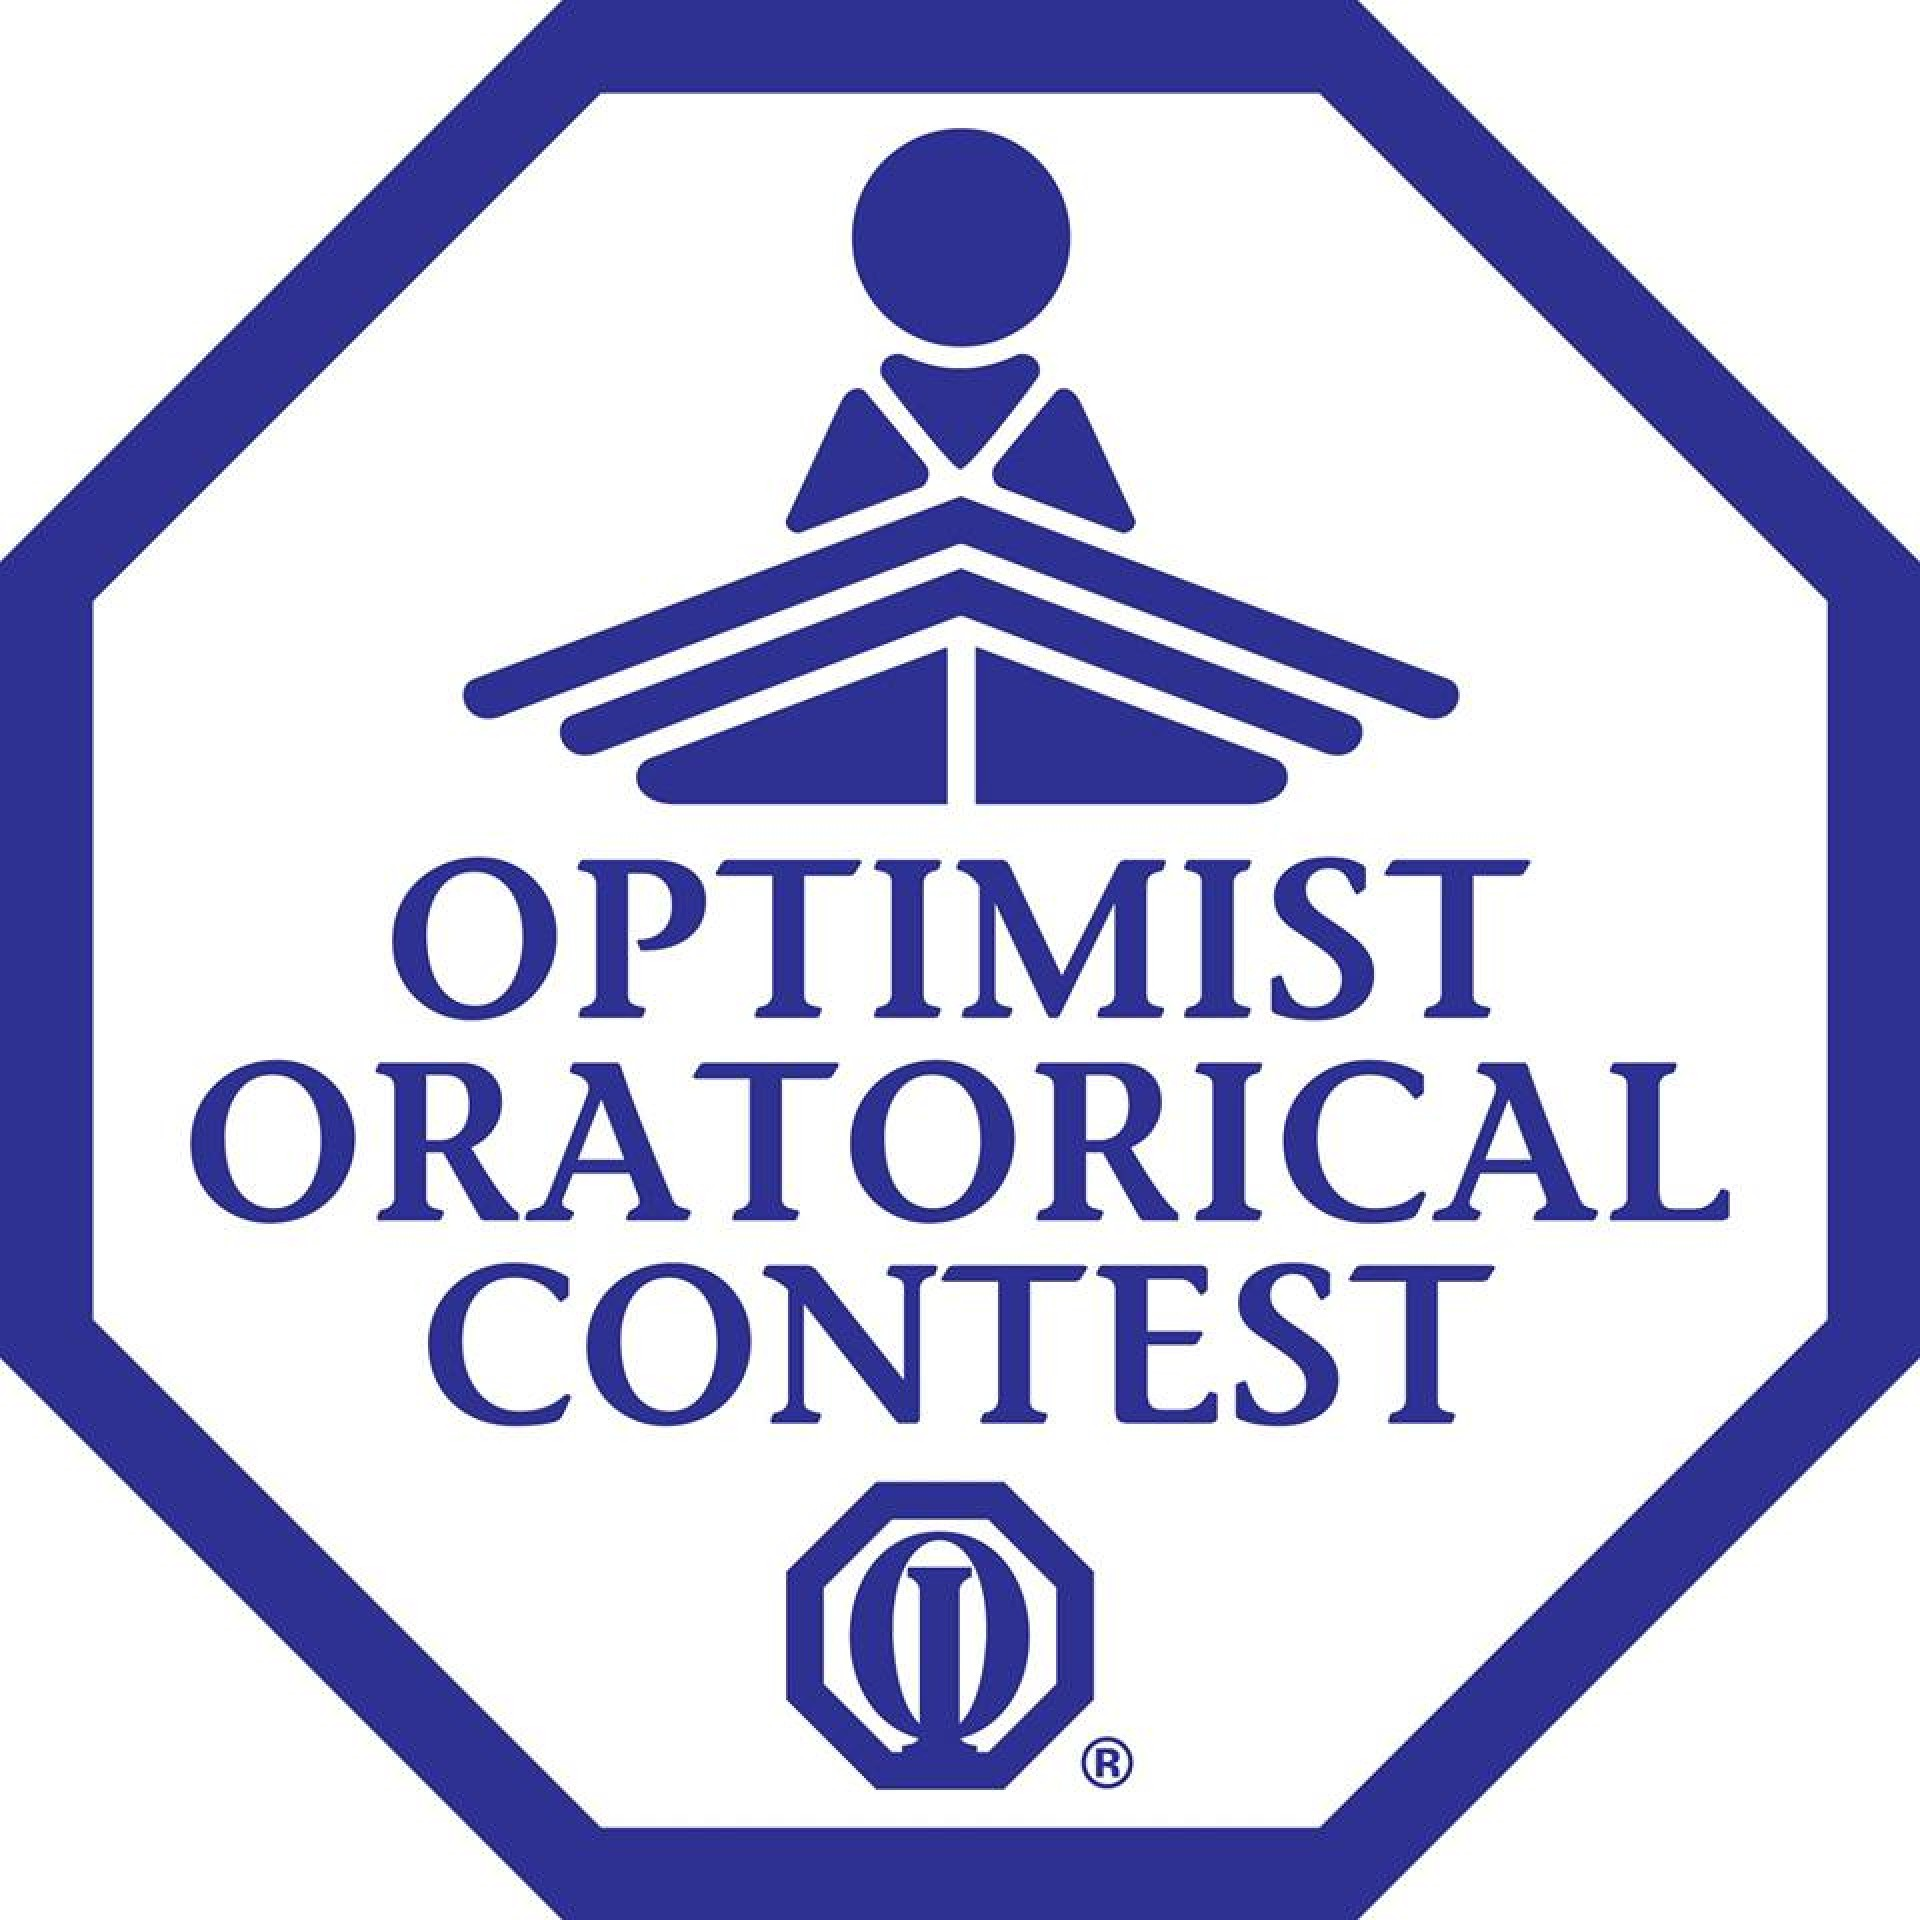 003 Oratorical20contest Optimist International Essay Contest Wondrous Oratorical Winners Rules 1920